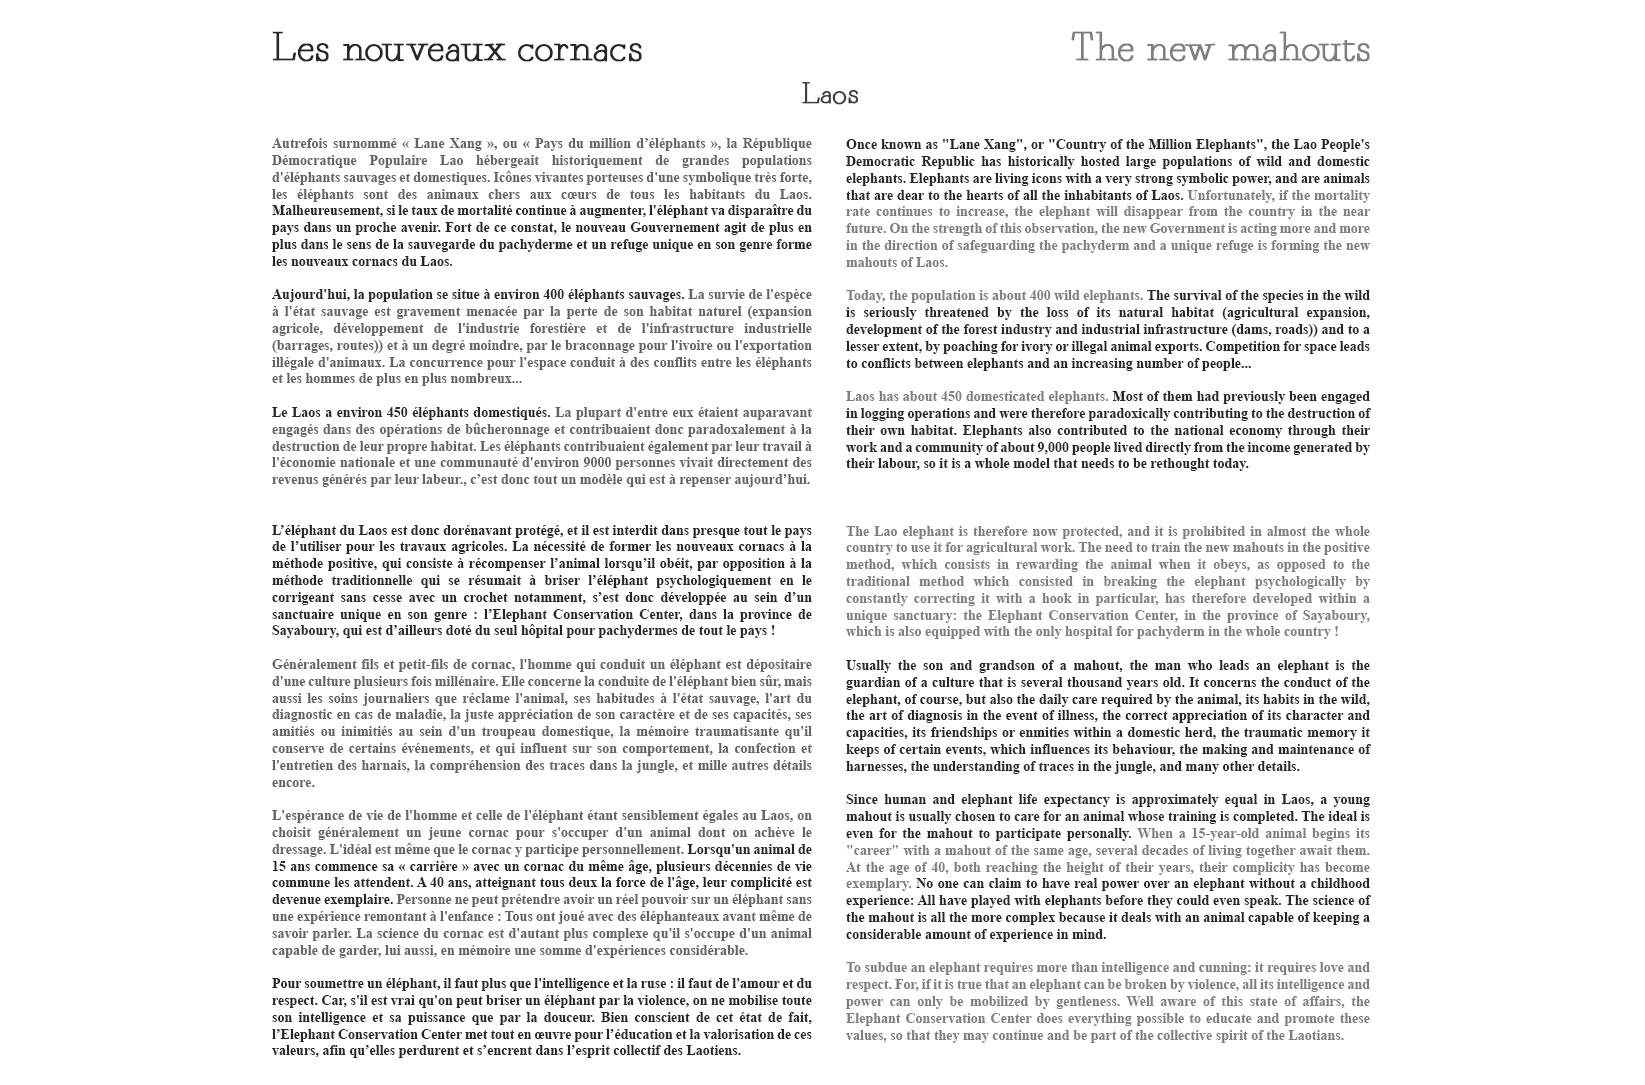 texte ecc laos nouveaux cornacs.jpg